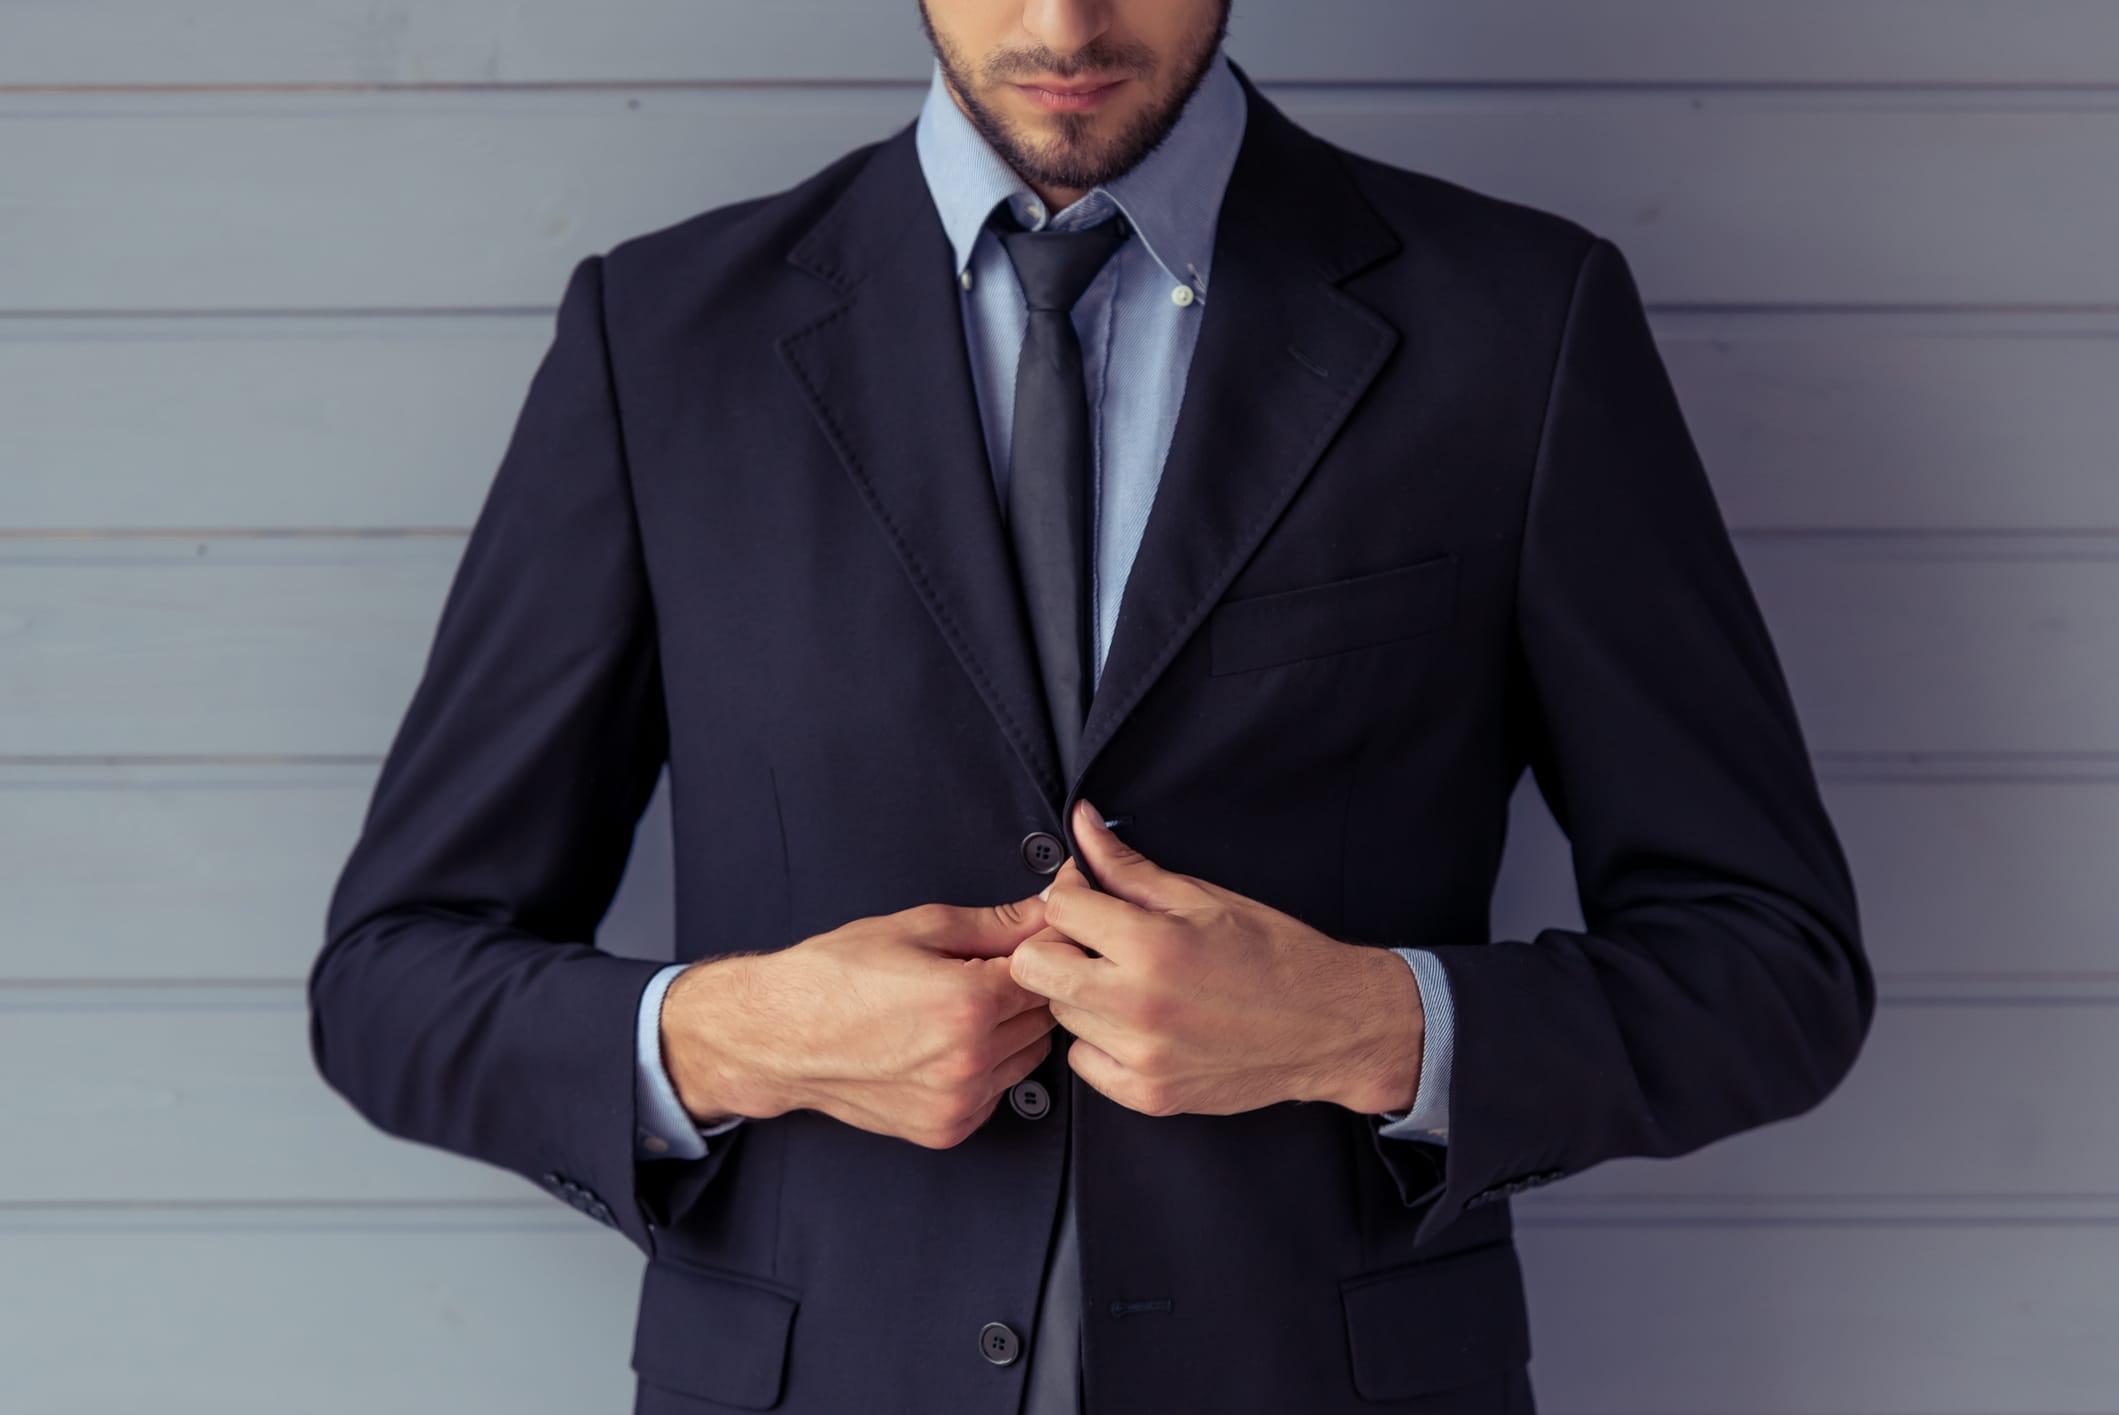 summit garage barbour jacket navy erp help desk support barbour jacket navy erp help desk support interview questions